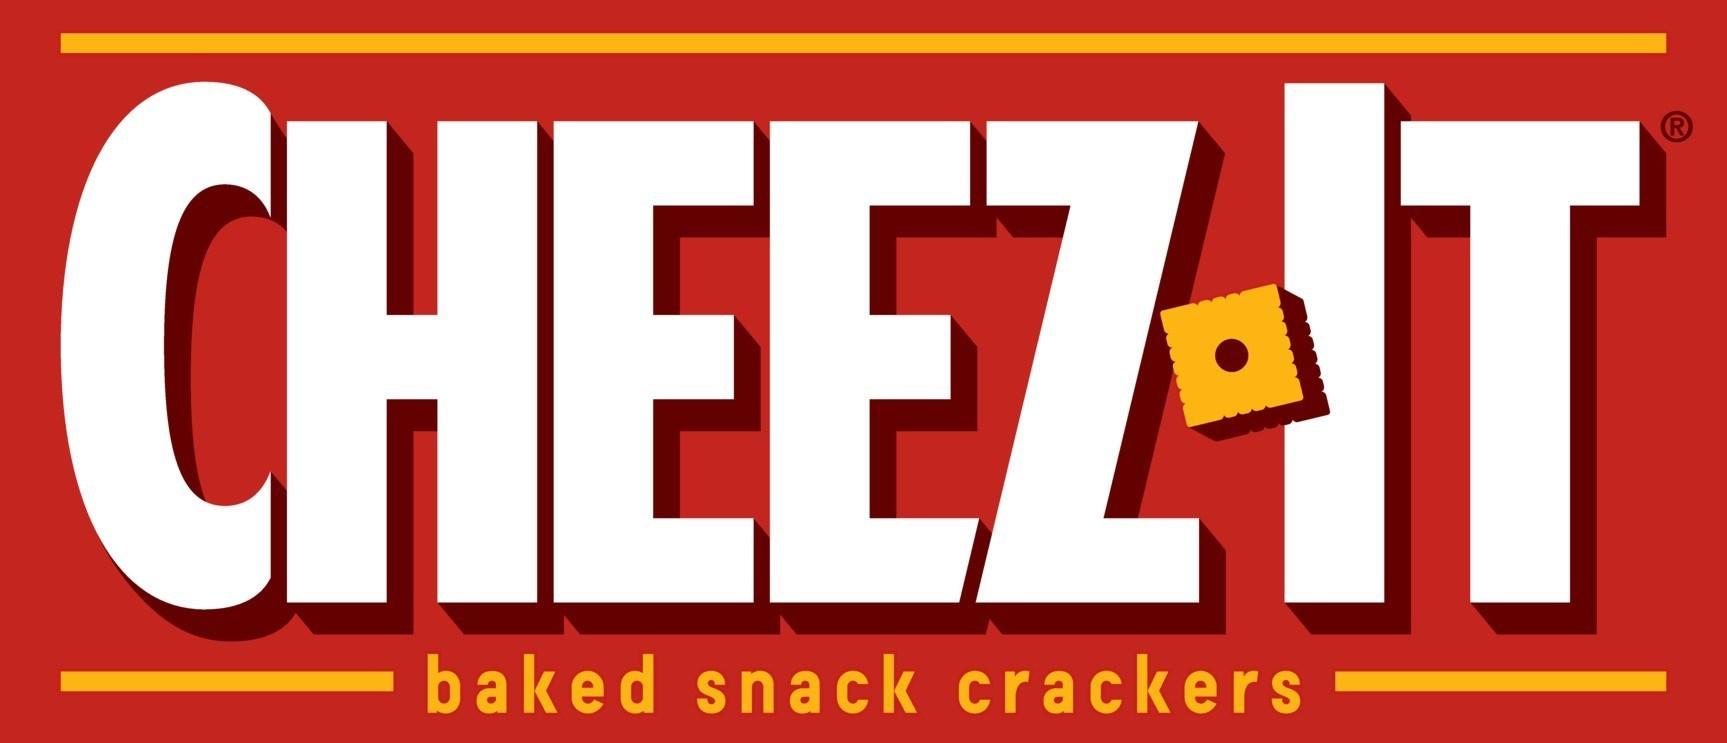 Cheeze-It